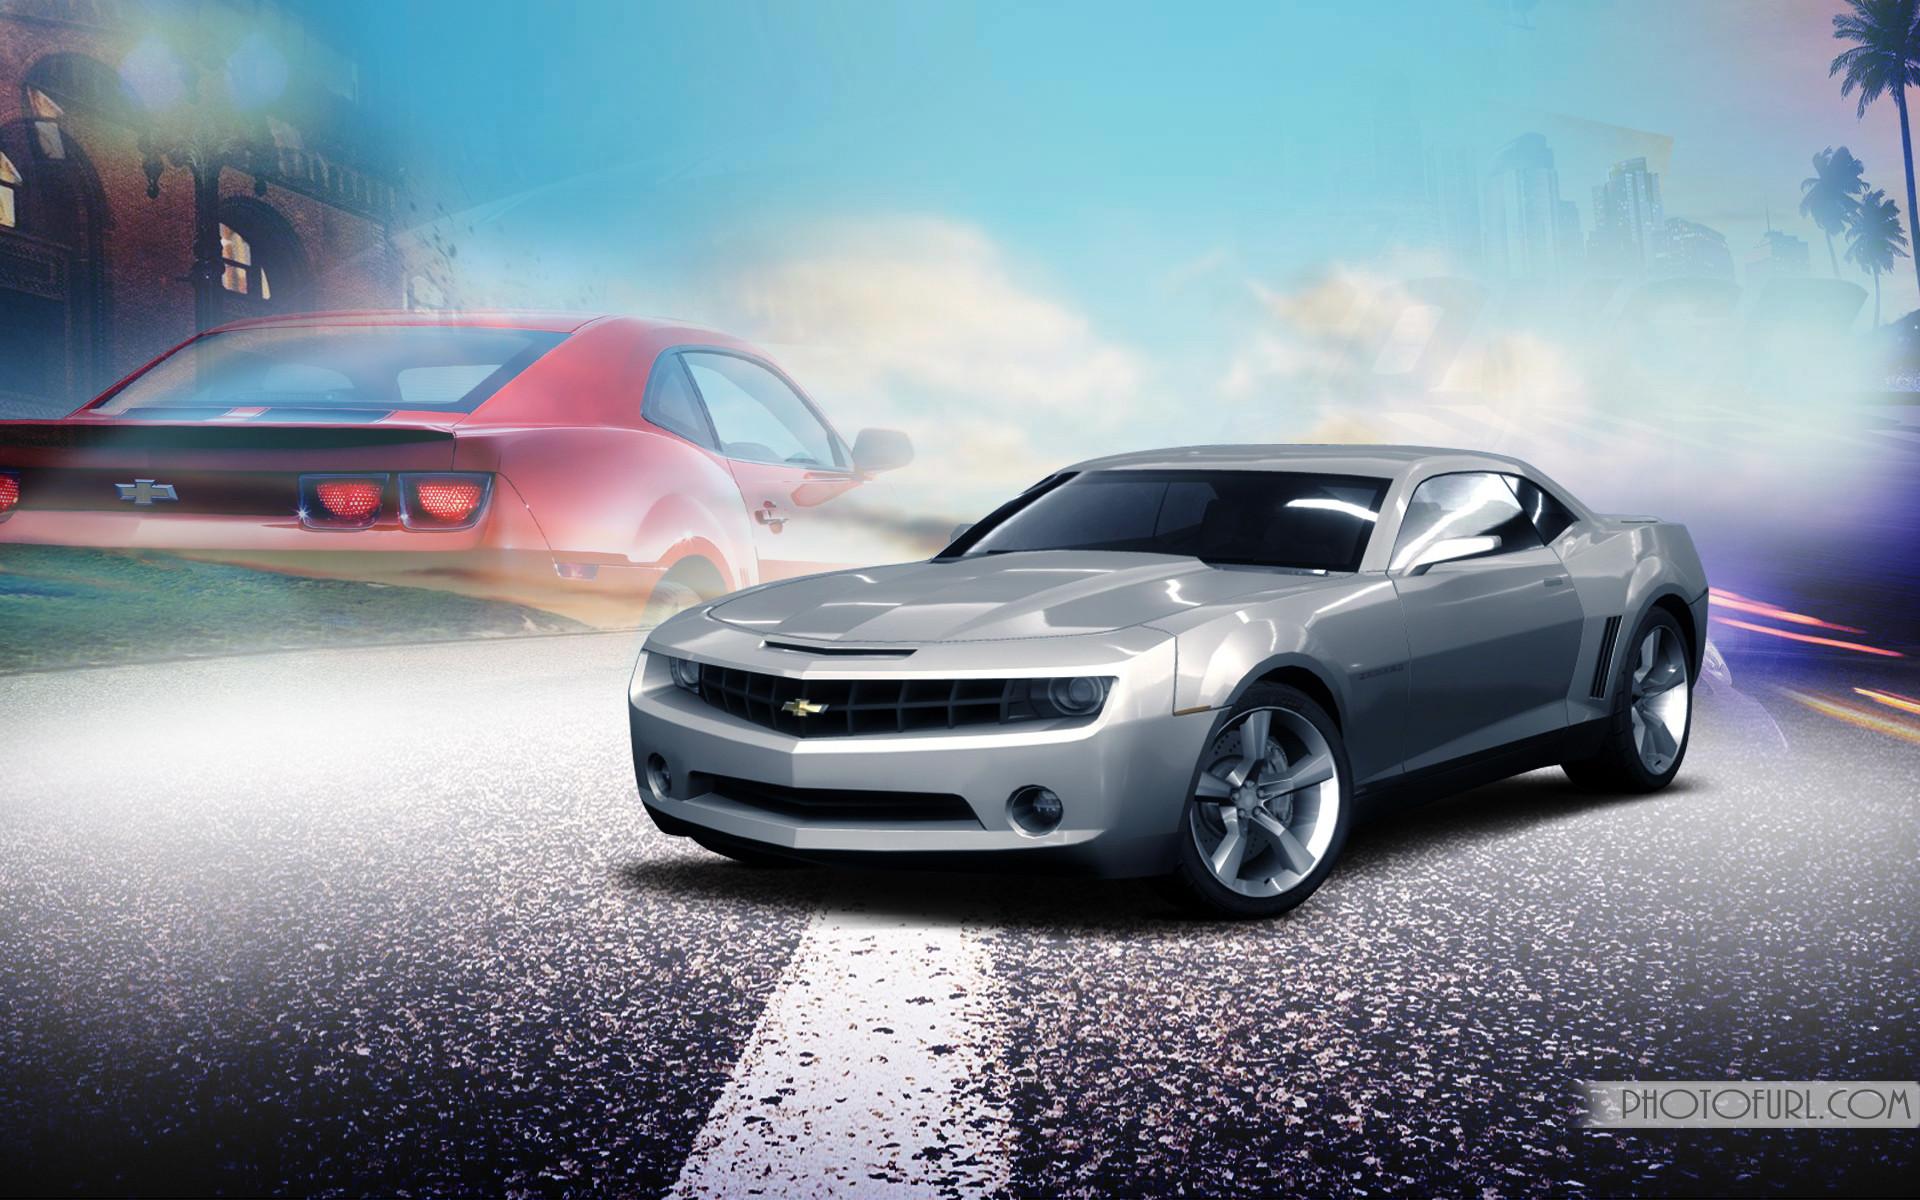 free camaro screensavers wallpapers desktop themes | Camaro Car in Animated  Style Wallpaper | Free Wallpapers